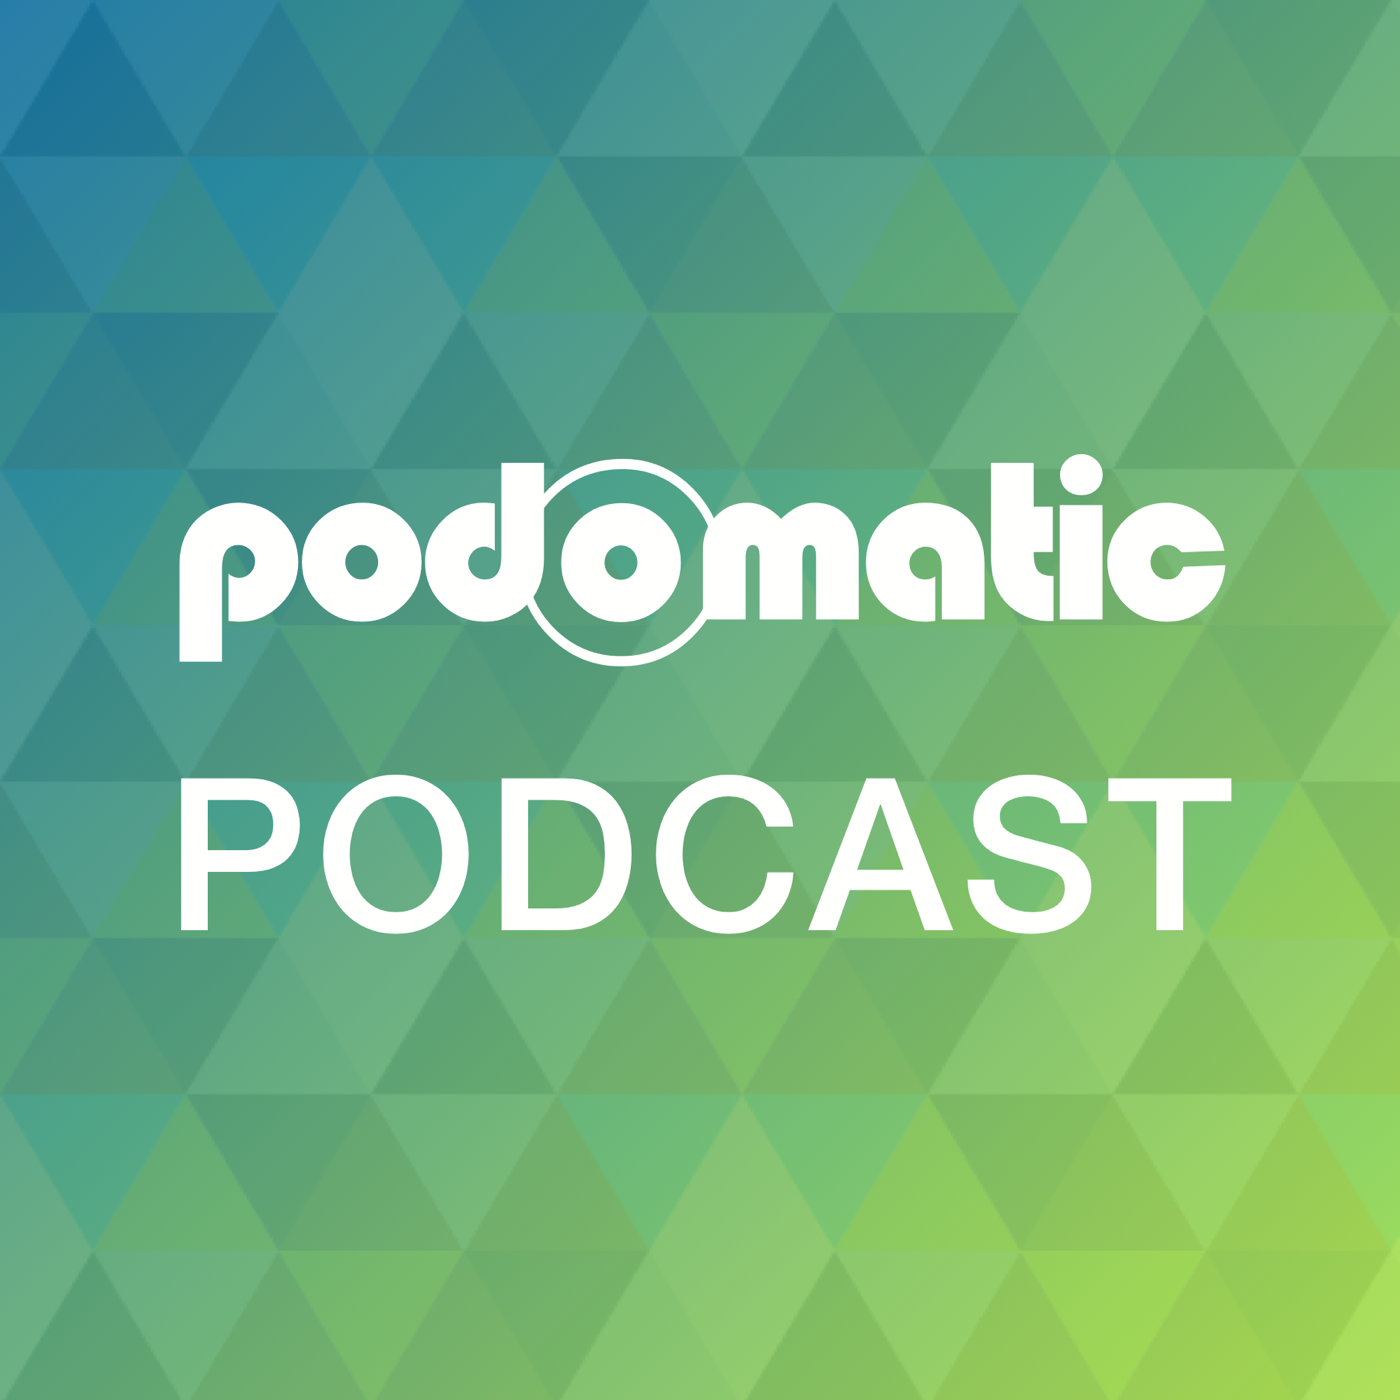 Zack Hadley's Podcast